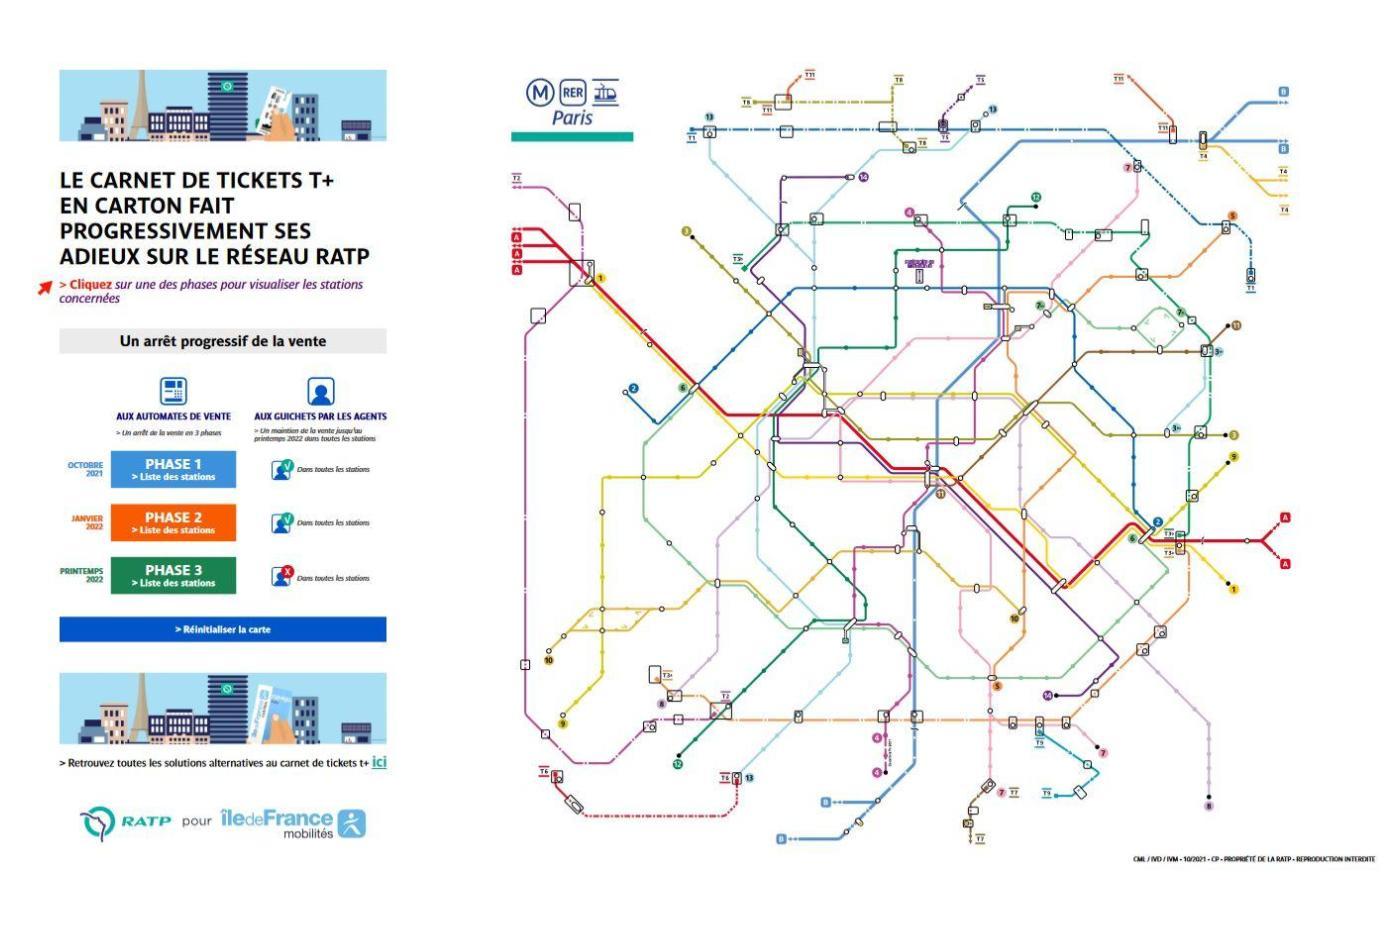 ratp map